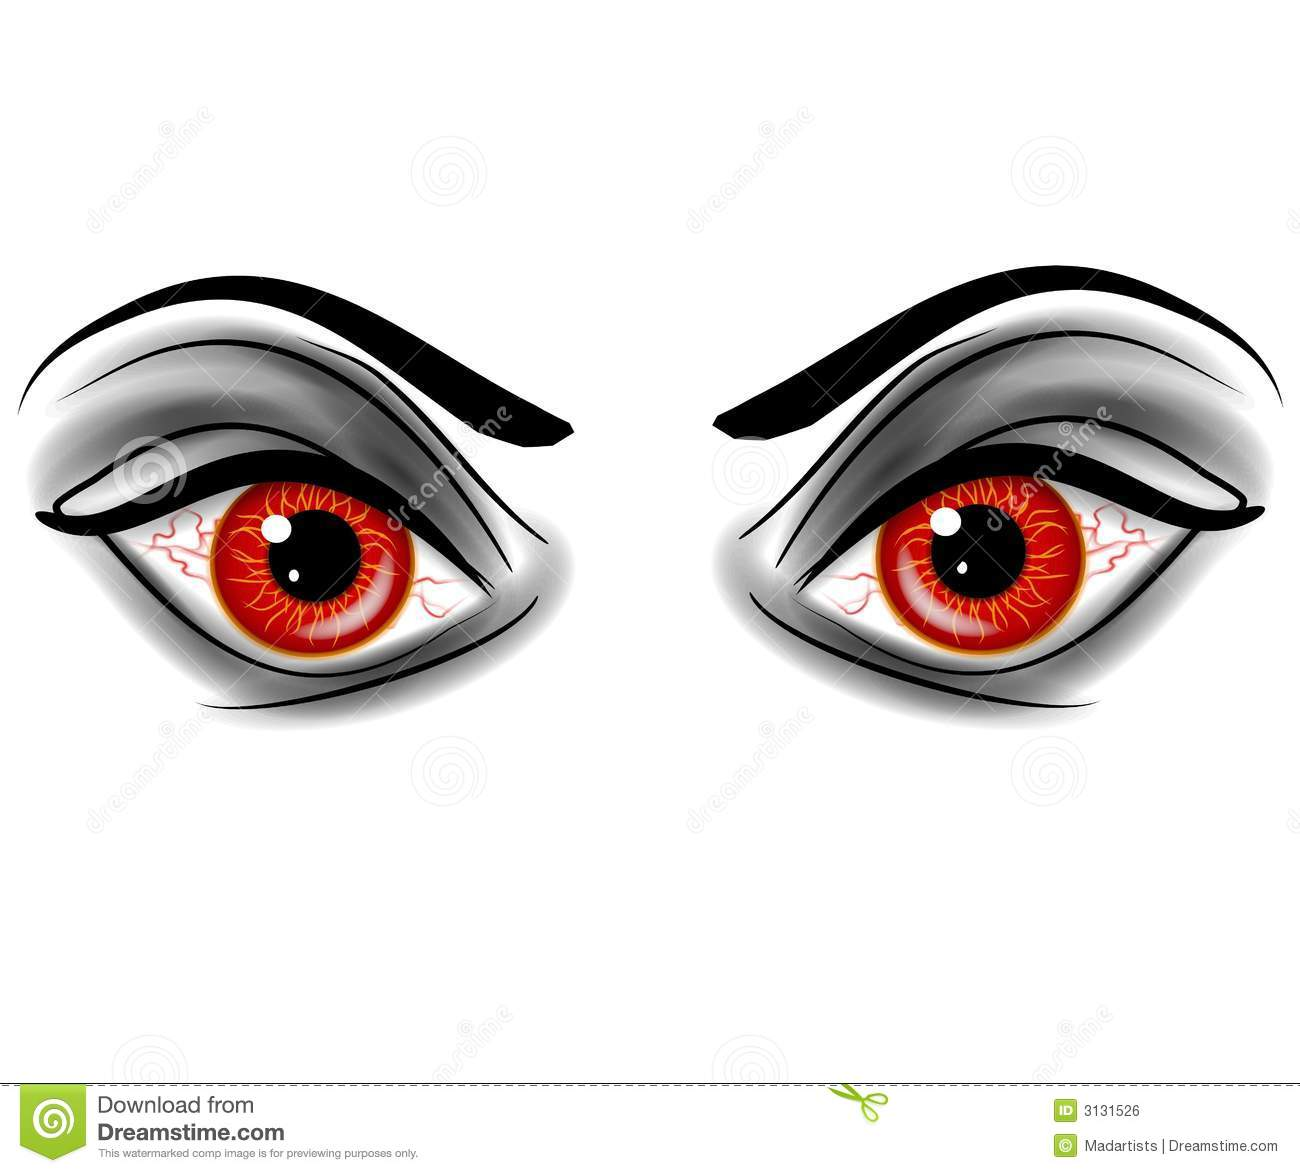 Demon eyes clipart.